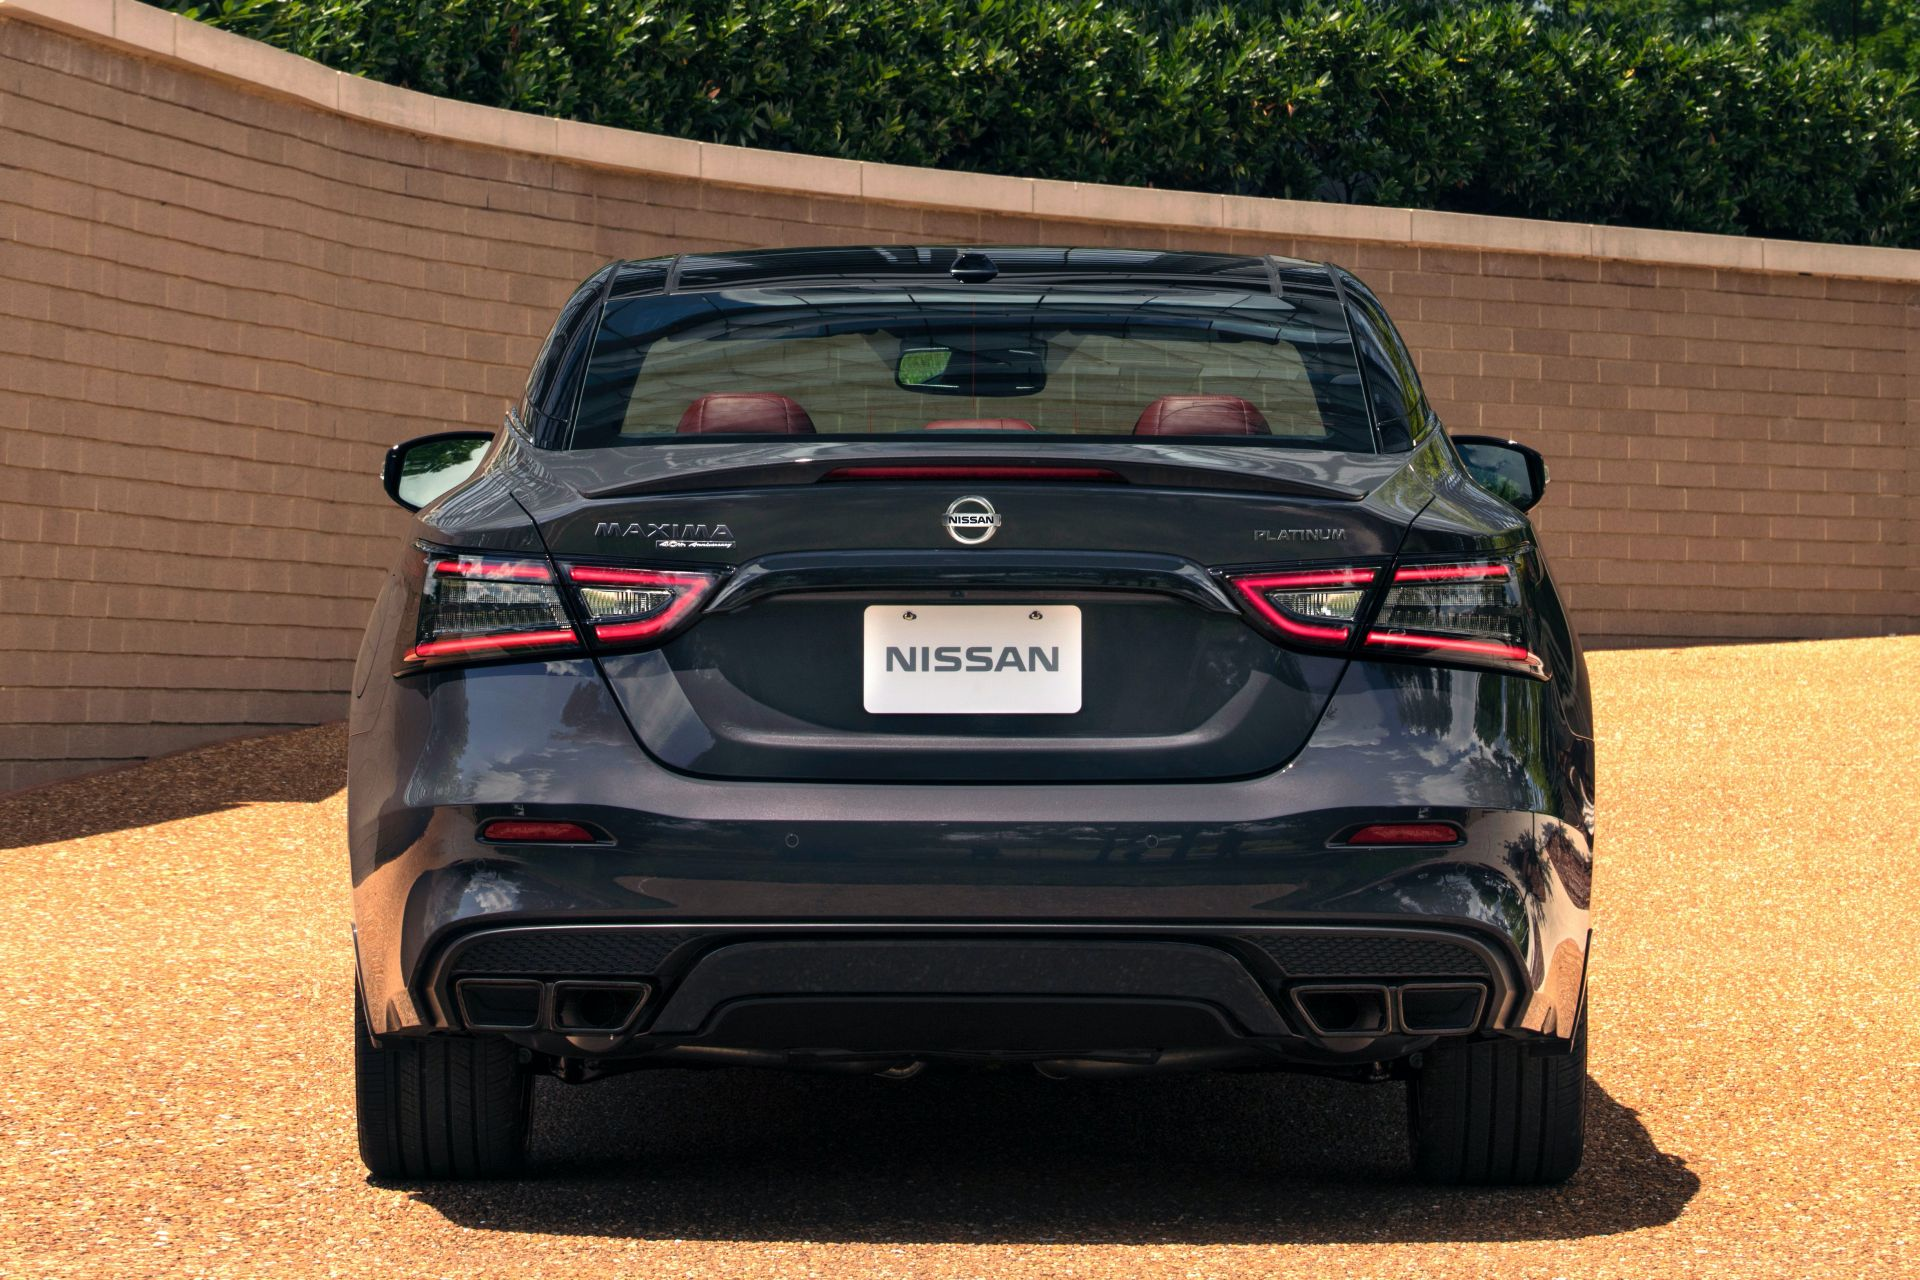 Nissan-Maxima-40th-Anniversary-Edition-12